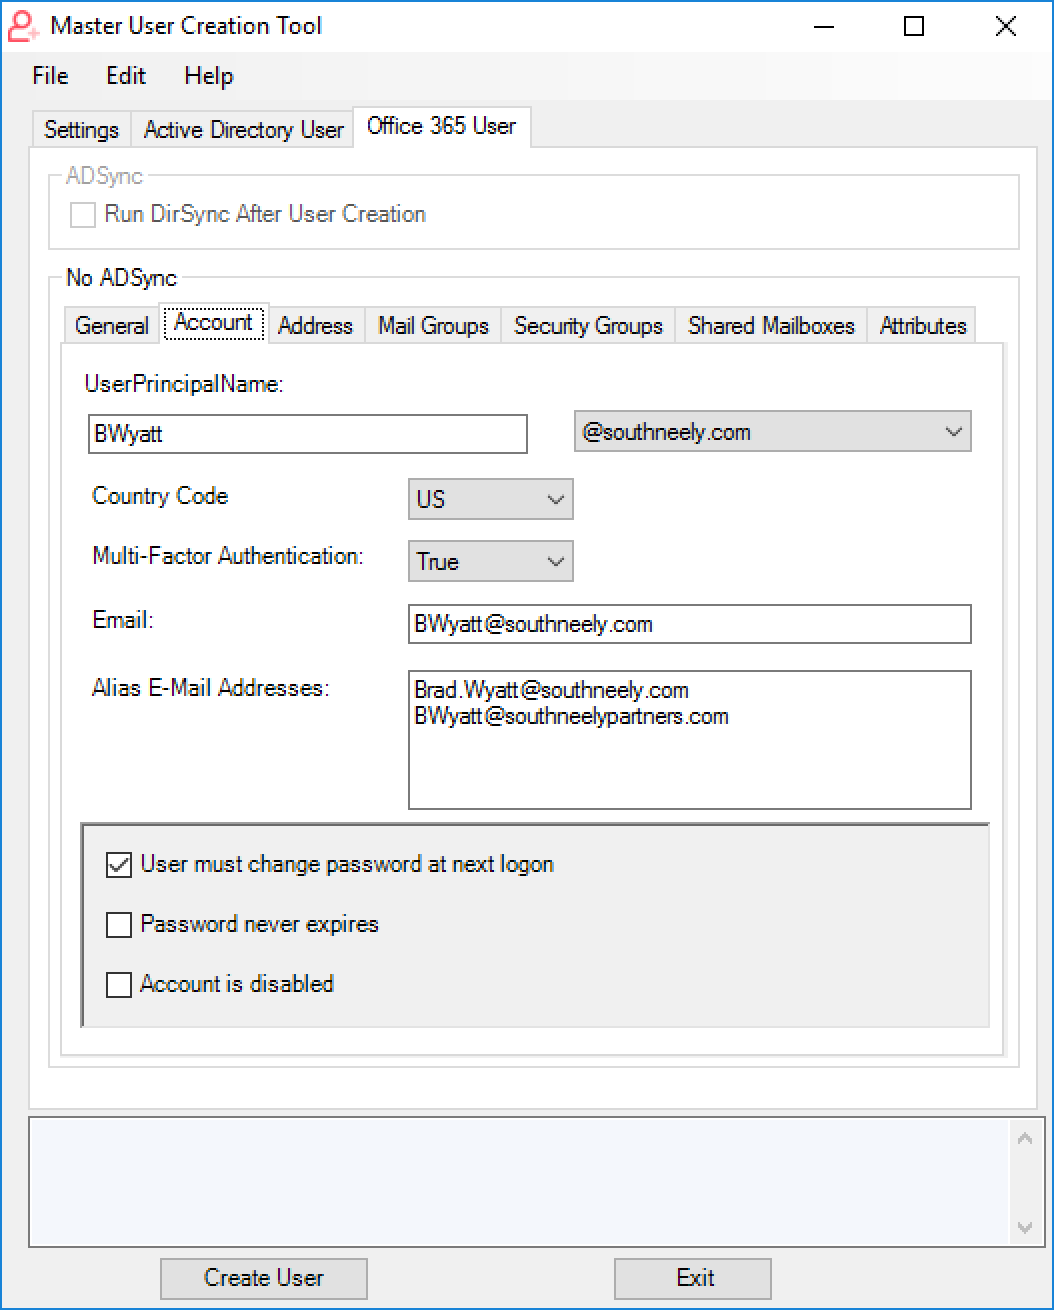 GitHub - bwya77/Master-User-Creator: GUI Application written in